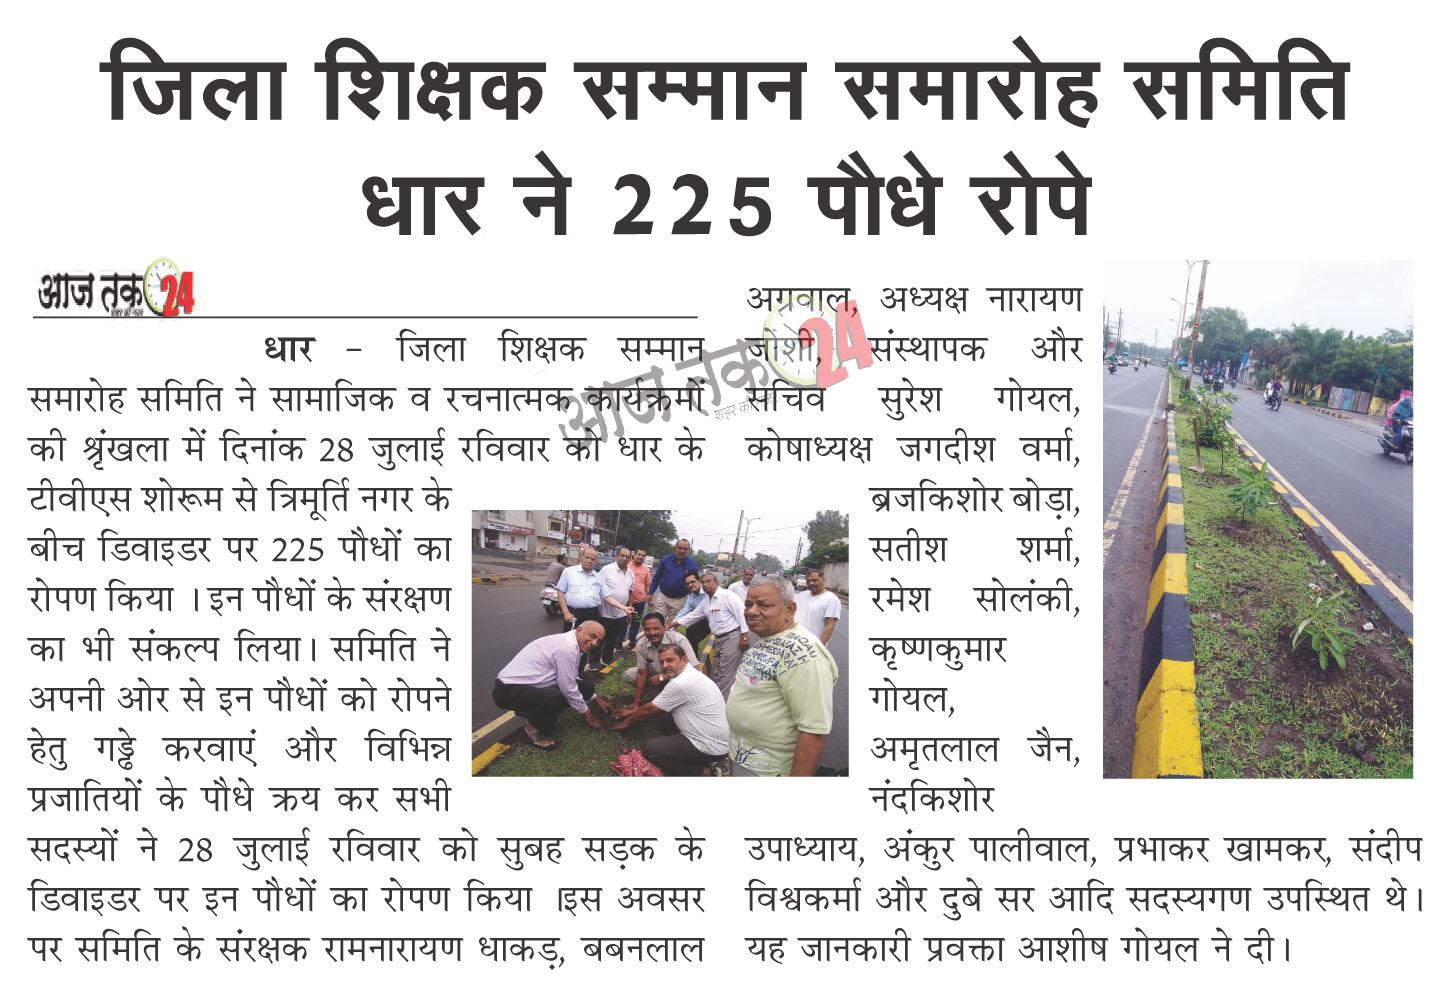 जिला शिक्षक सम्मान समारोह समिति धार ने 225 पौधे रोपे | jila shikshk samman smaroh samiti dhar ne 225 poudhe rope